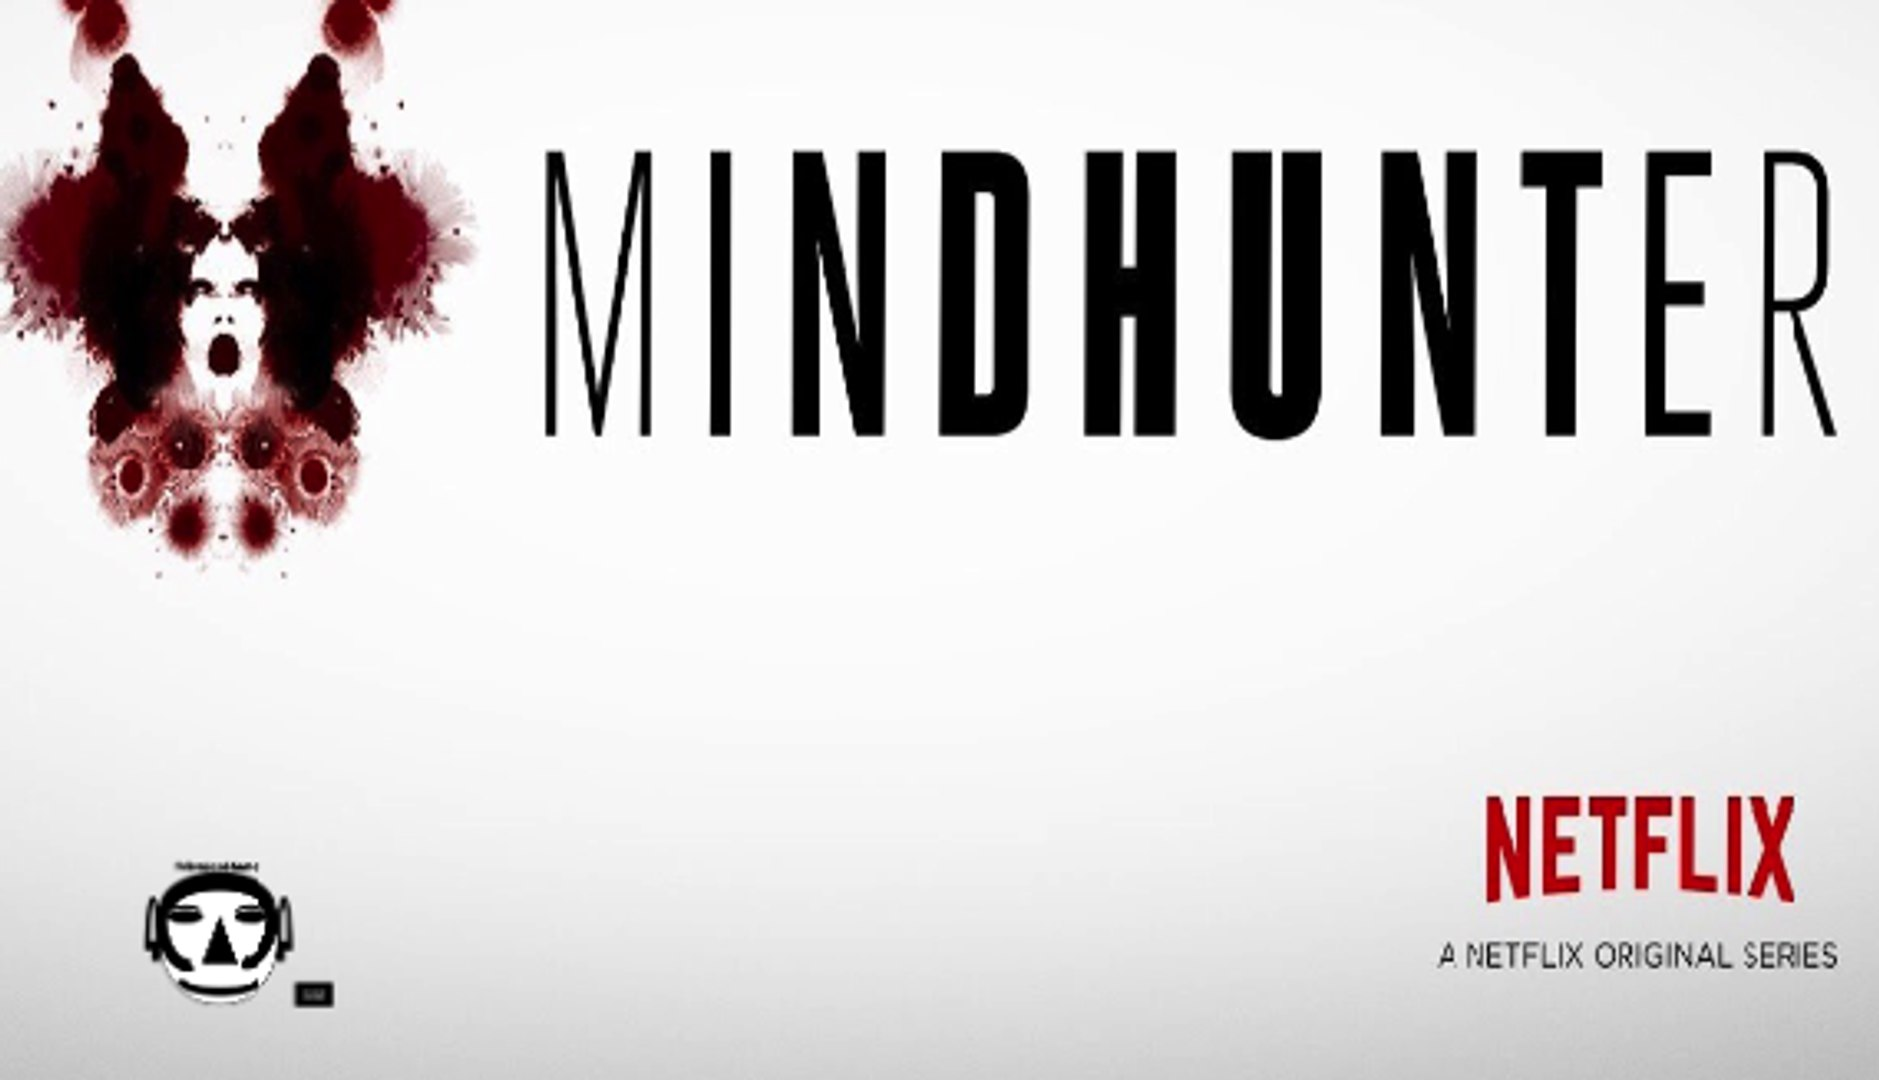 Mindhunter I Tv Series Trailer I Netflix Originals I Netflix 2017